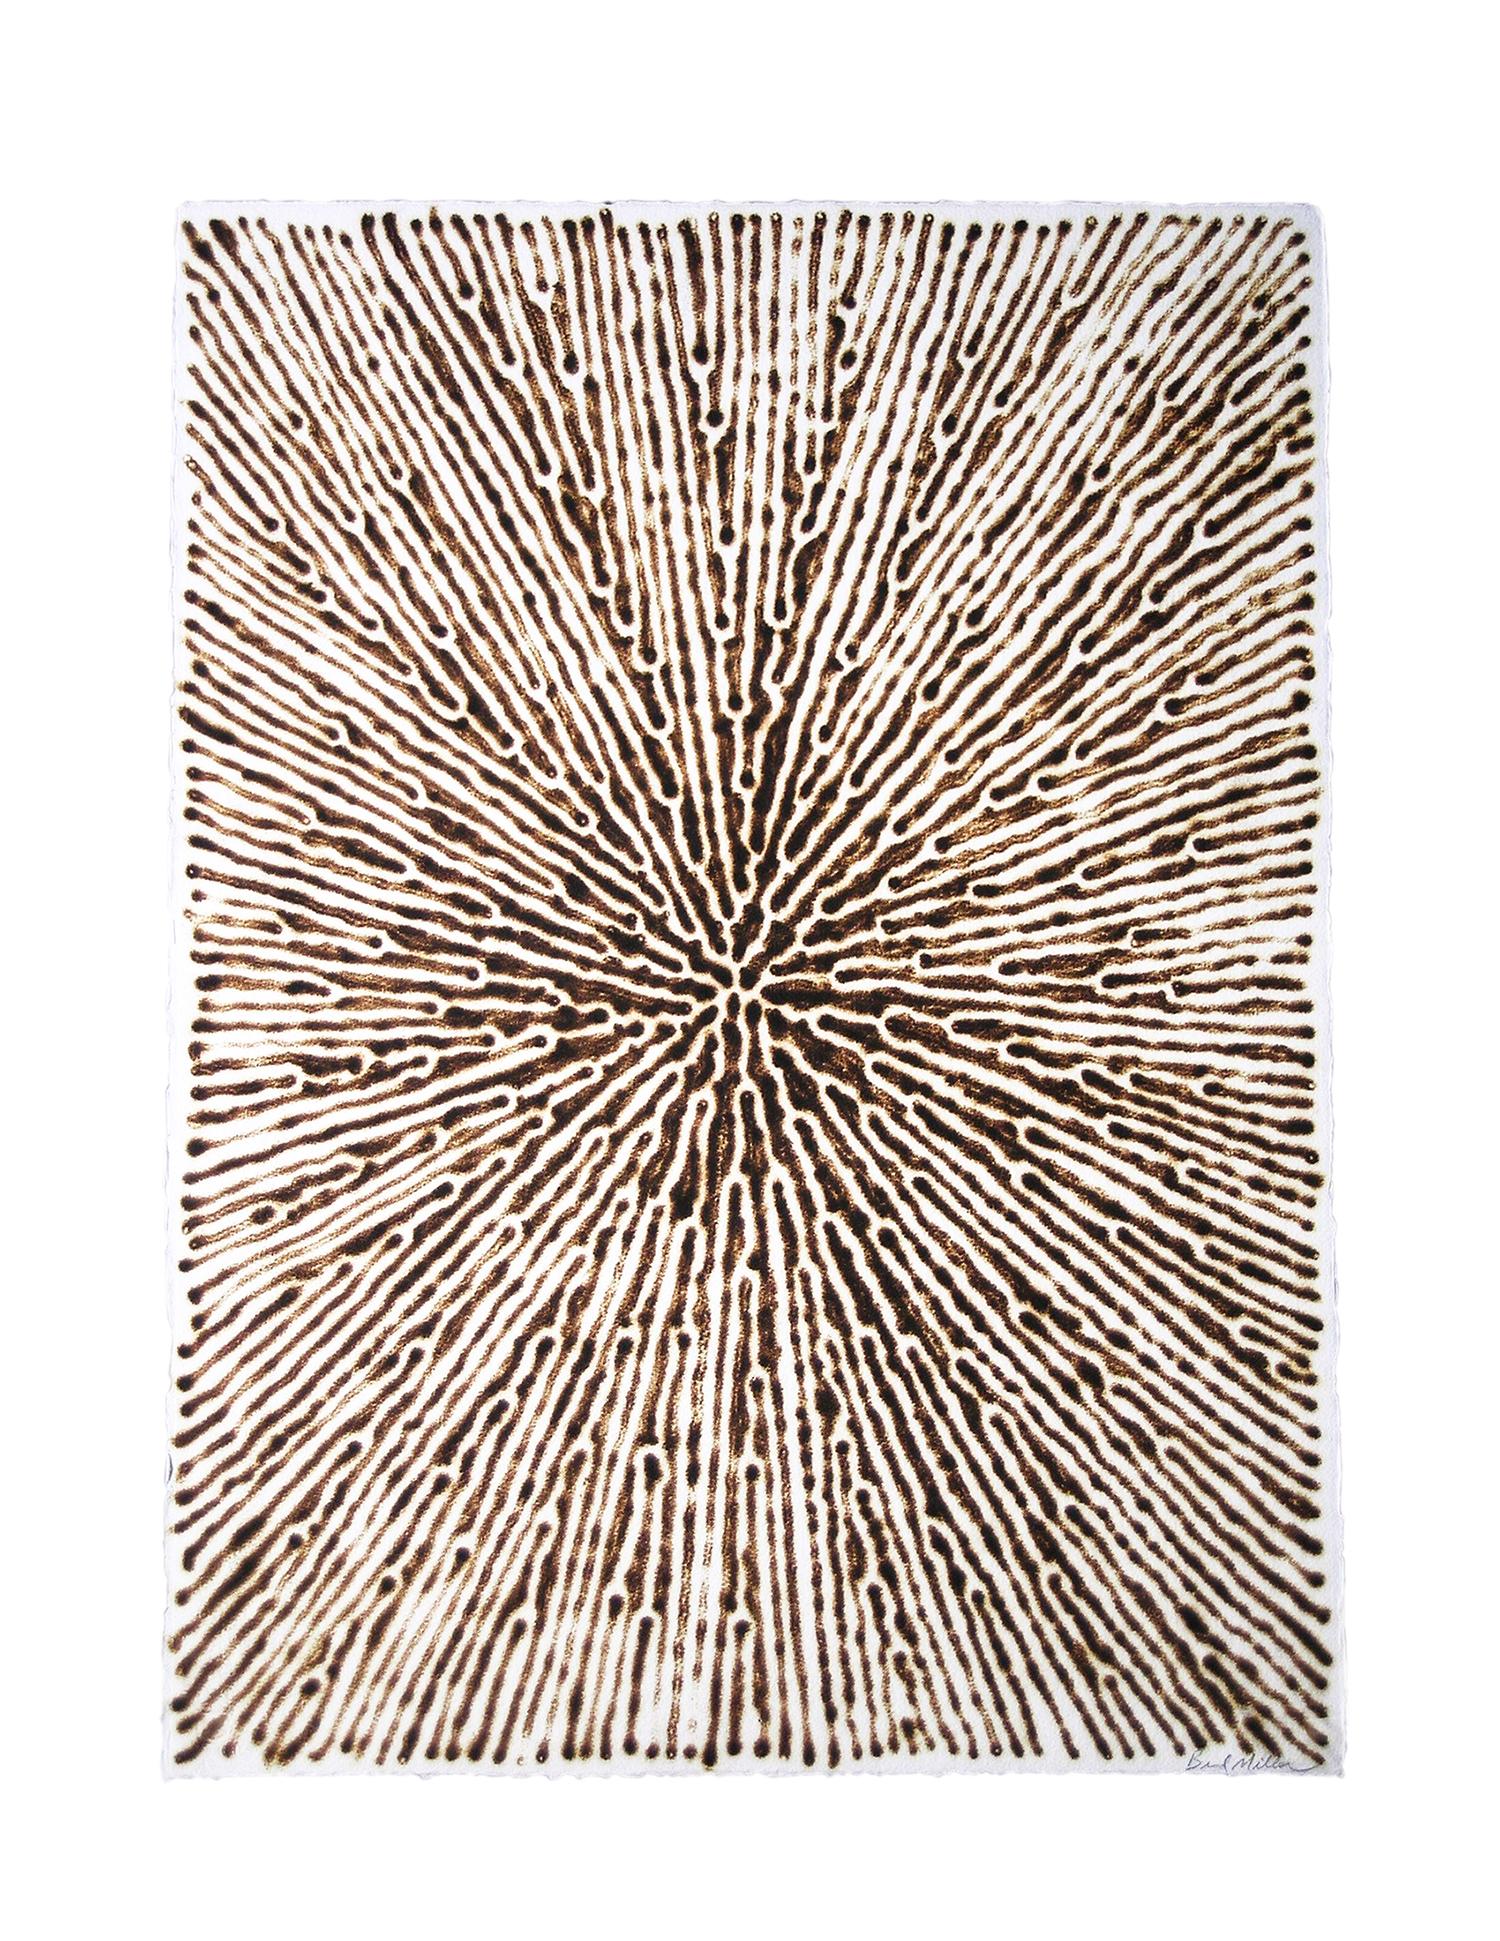 Brad Miller, Burn Drawing